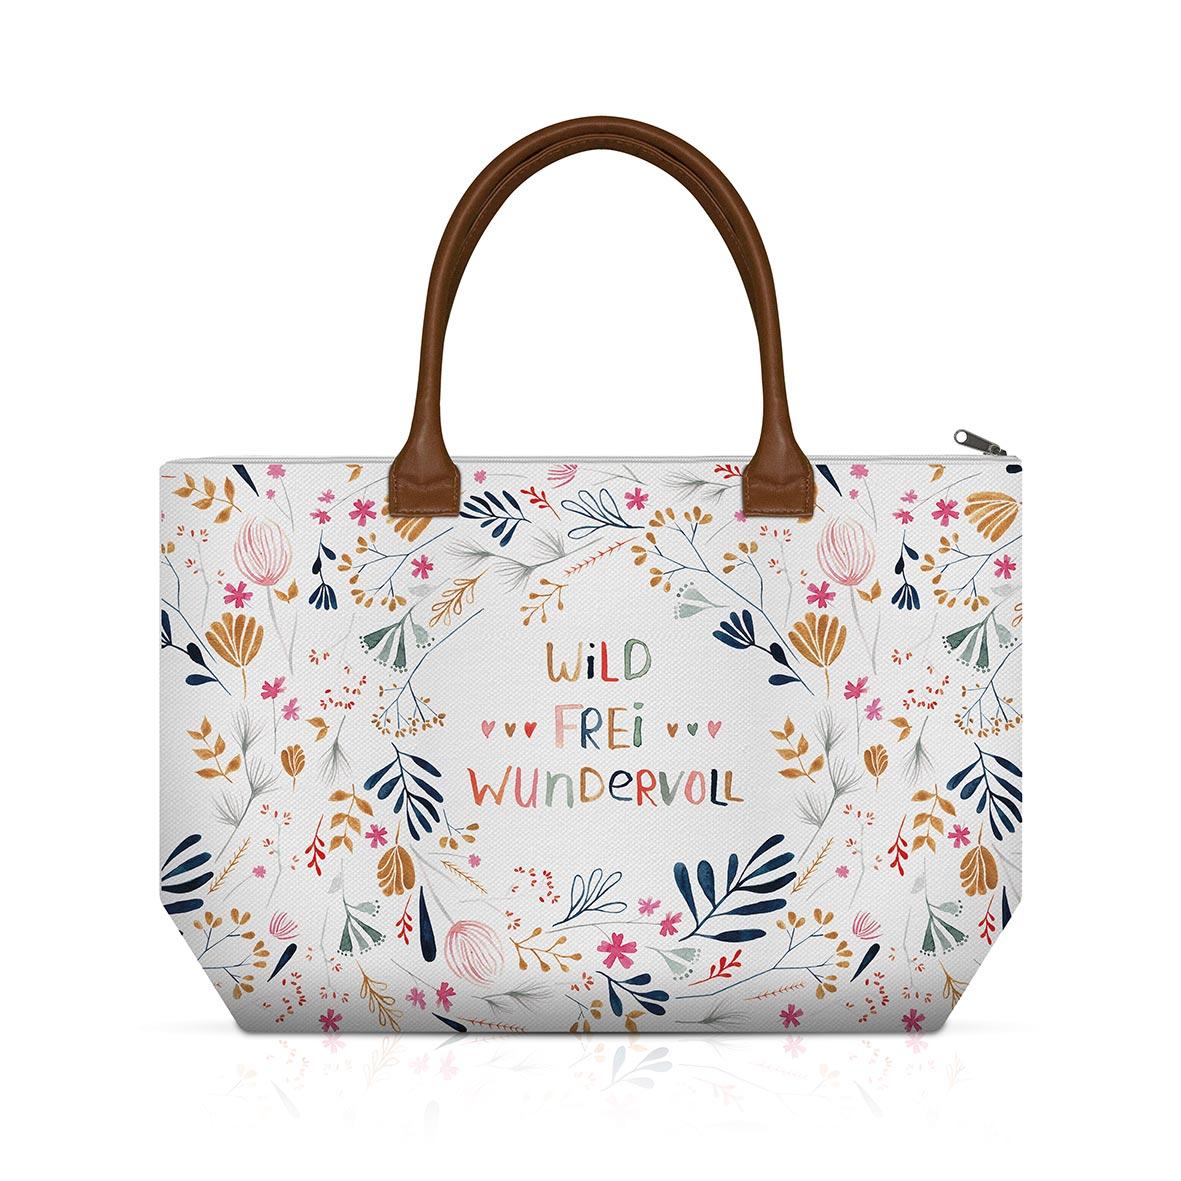 Wild, Frei, Wundervoll Shopping Bag